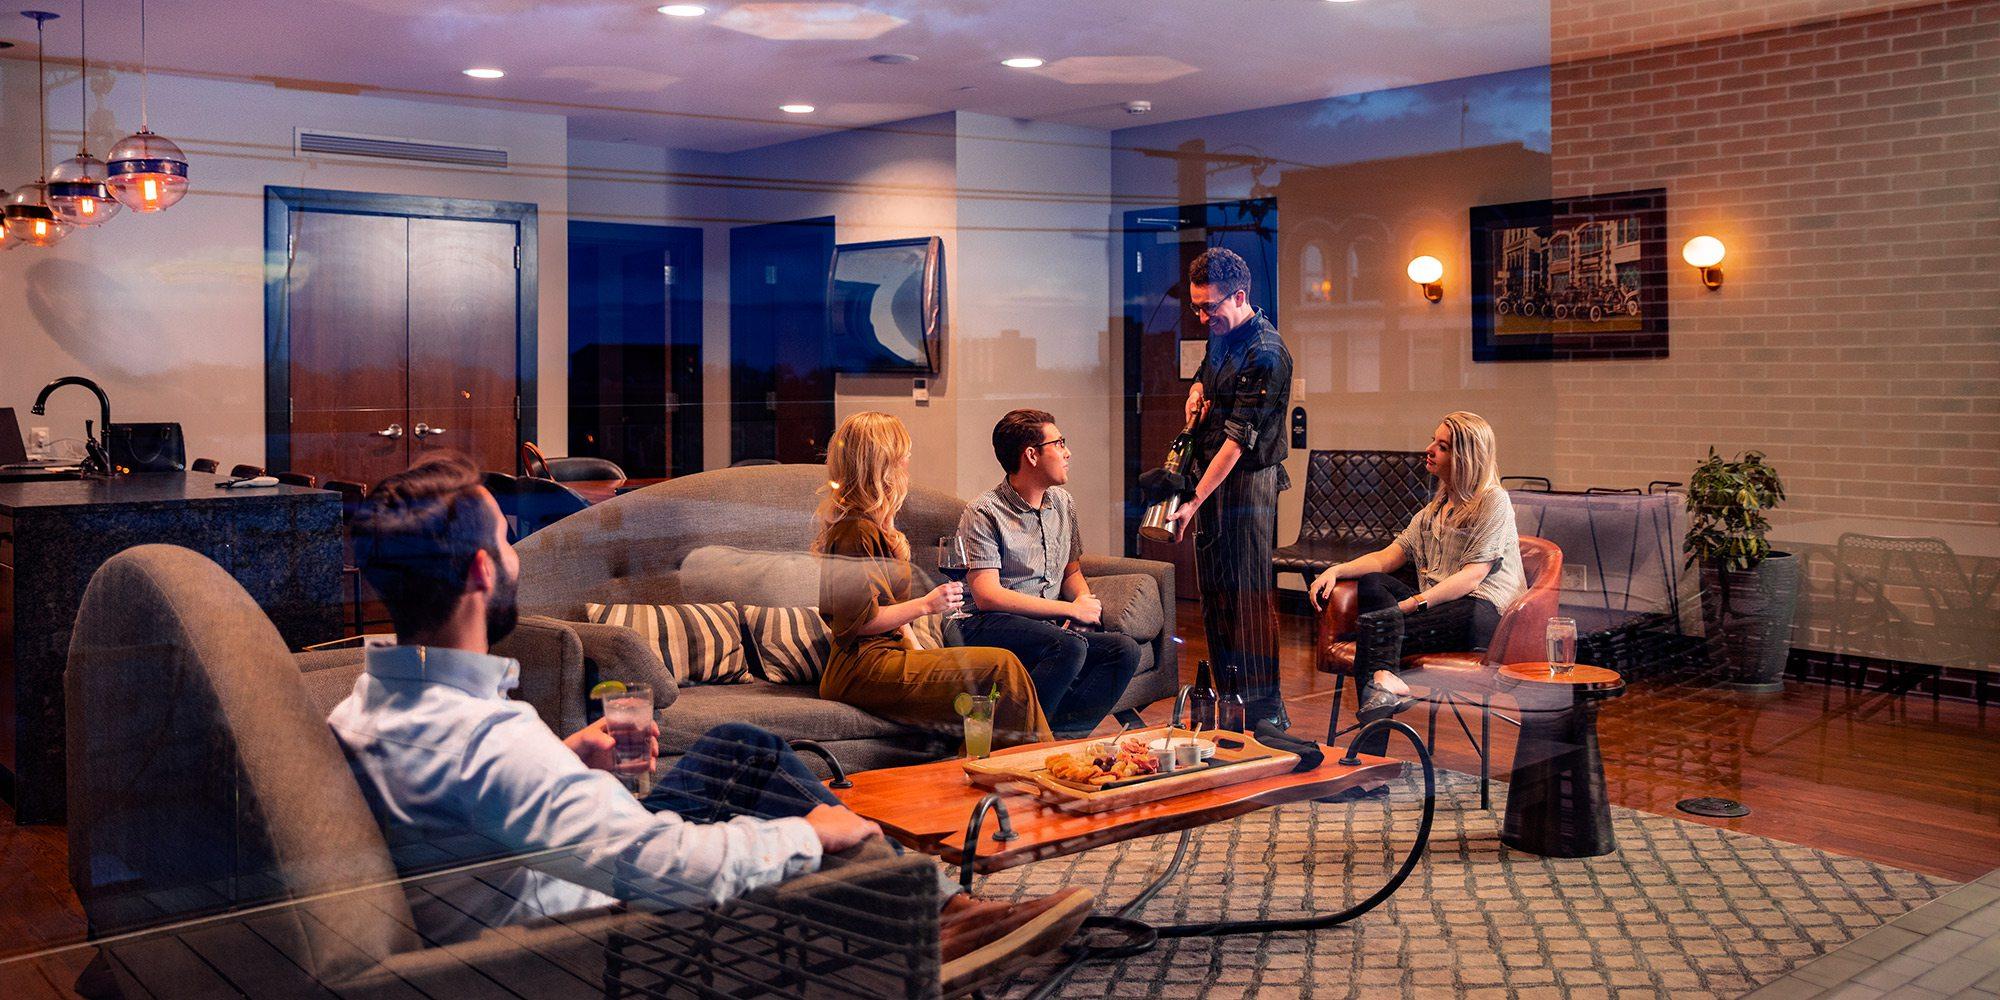 Hotel Vandivort, luxury hotel in downtown Springfield, MO